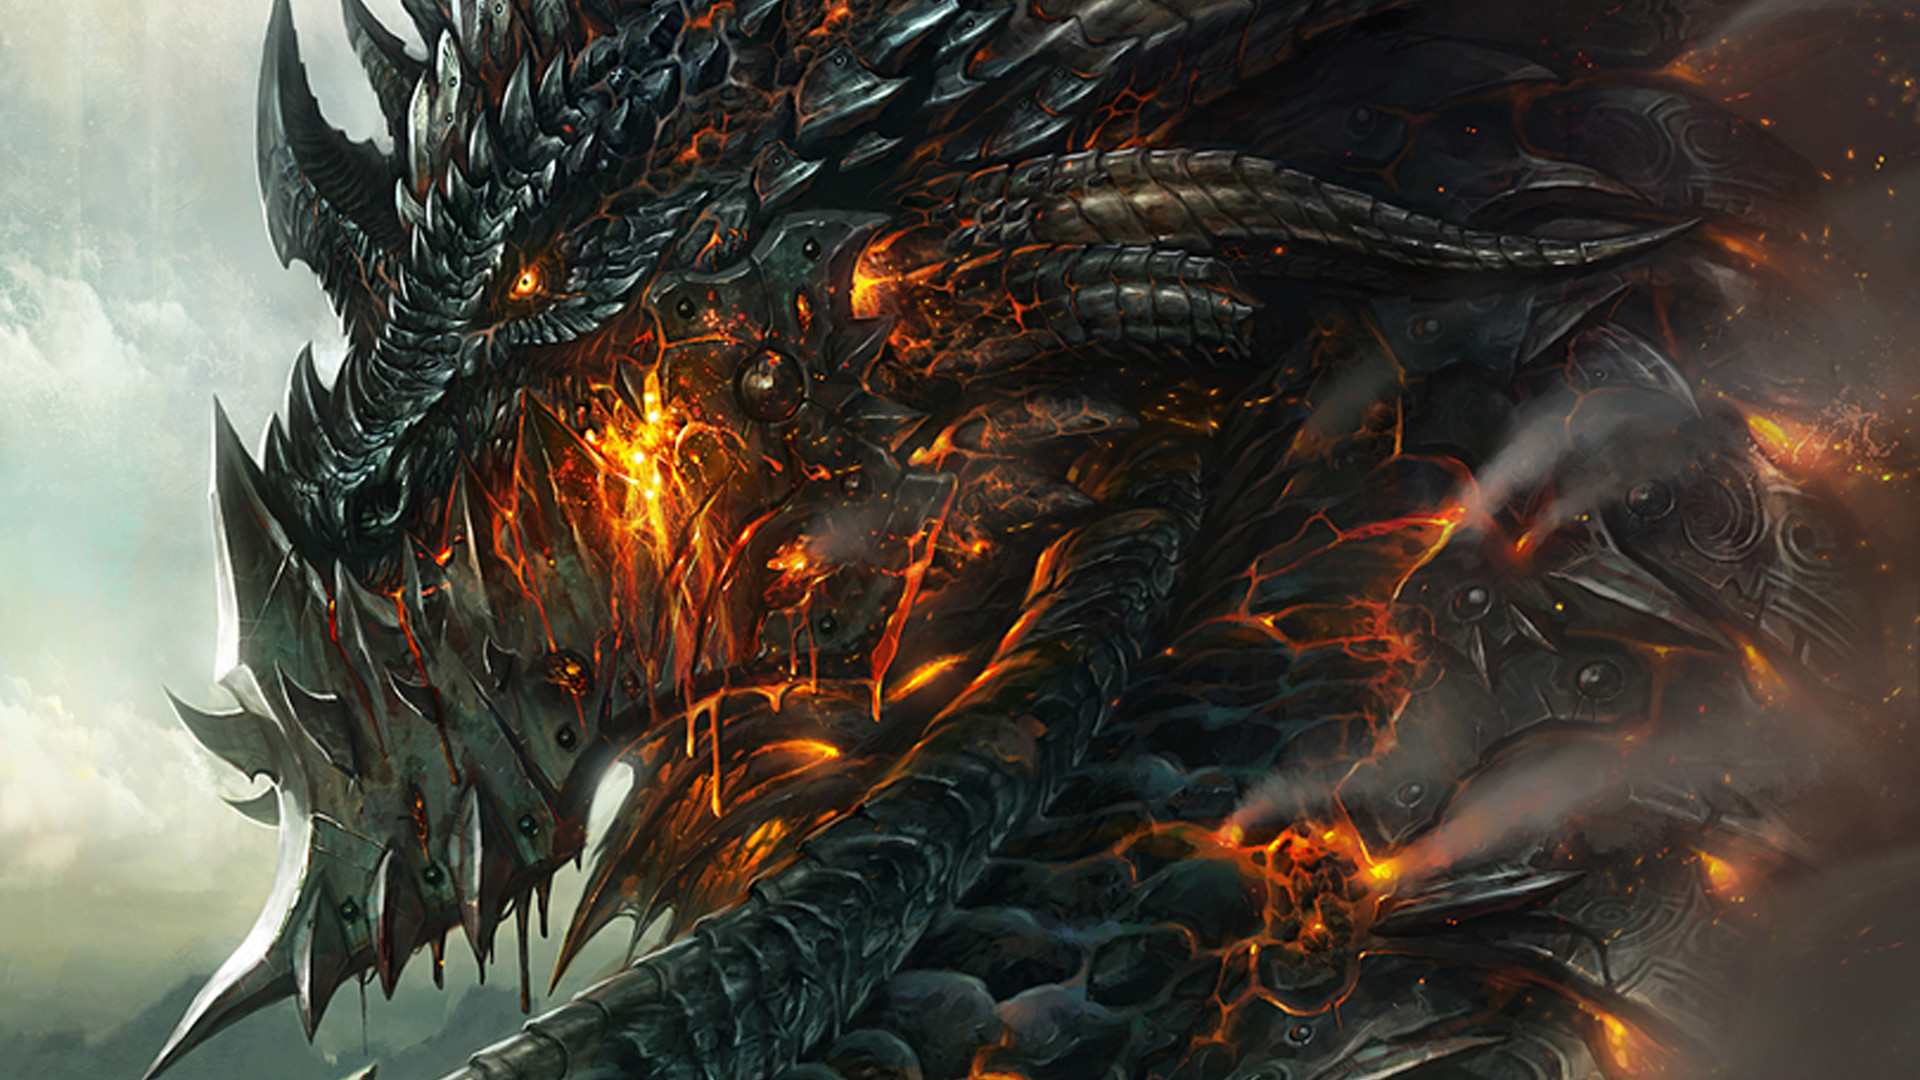 Dragon Wallpapers Images Desktop.